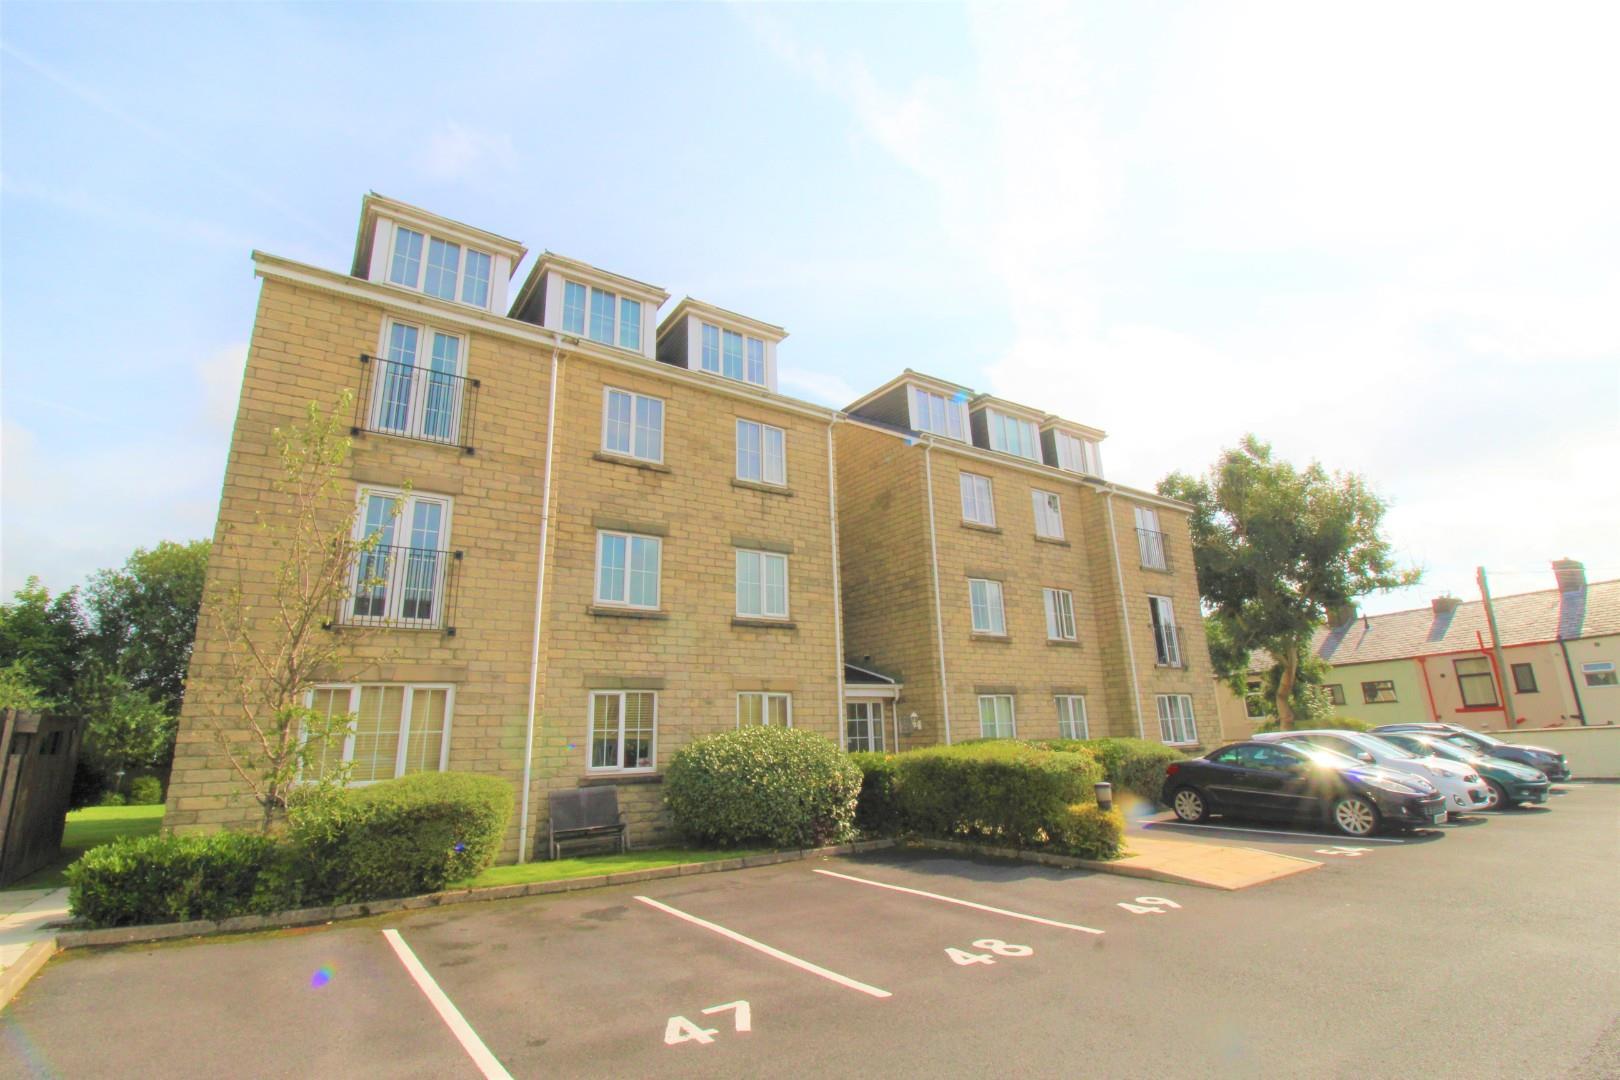 Edenhurst Apartments, Haslingden